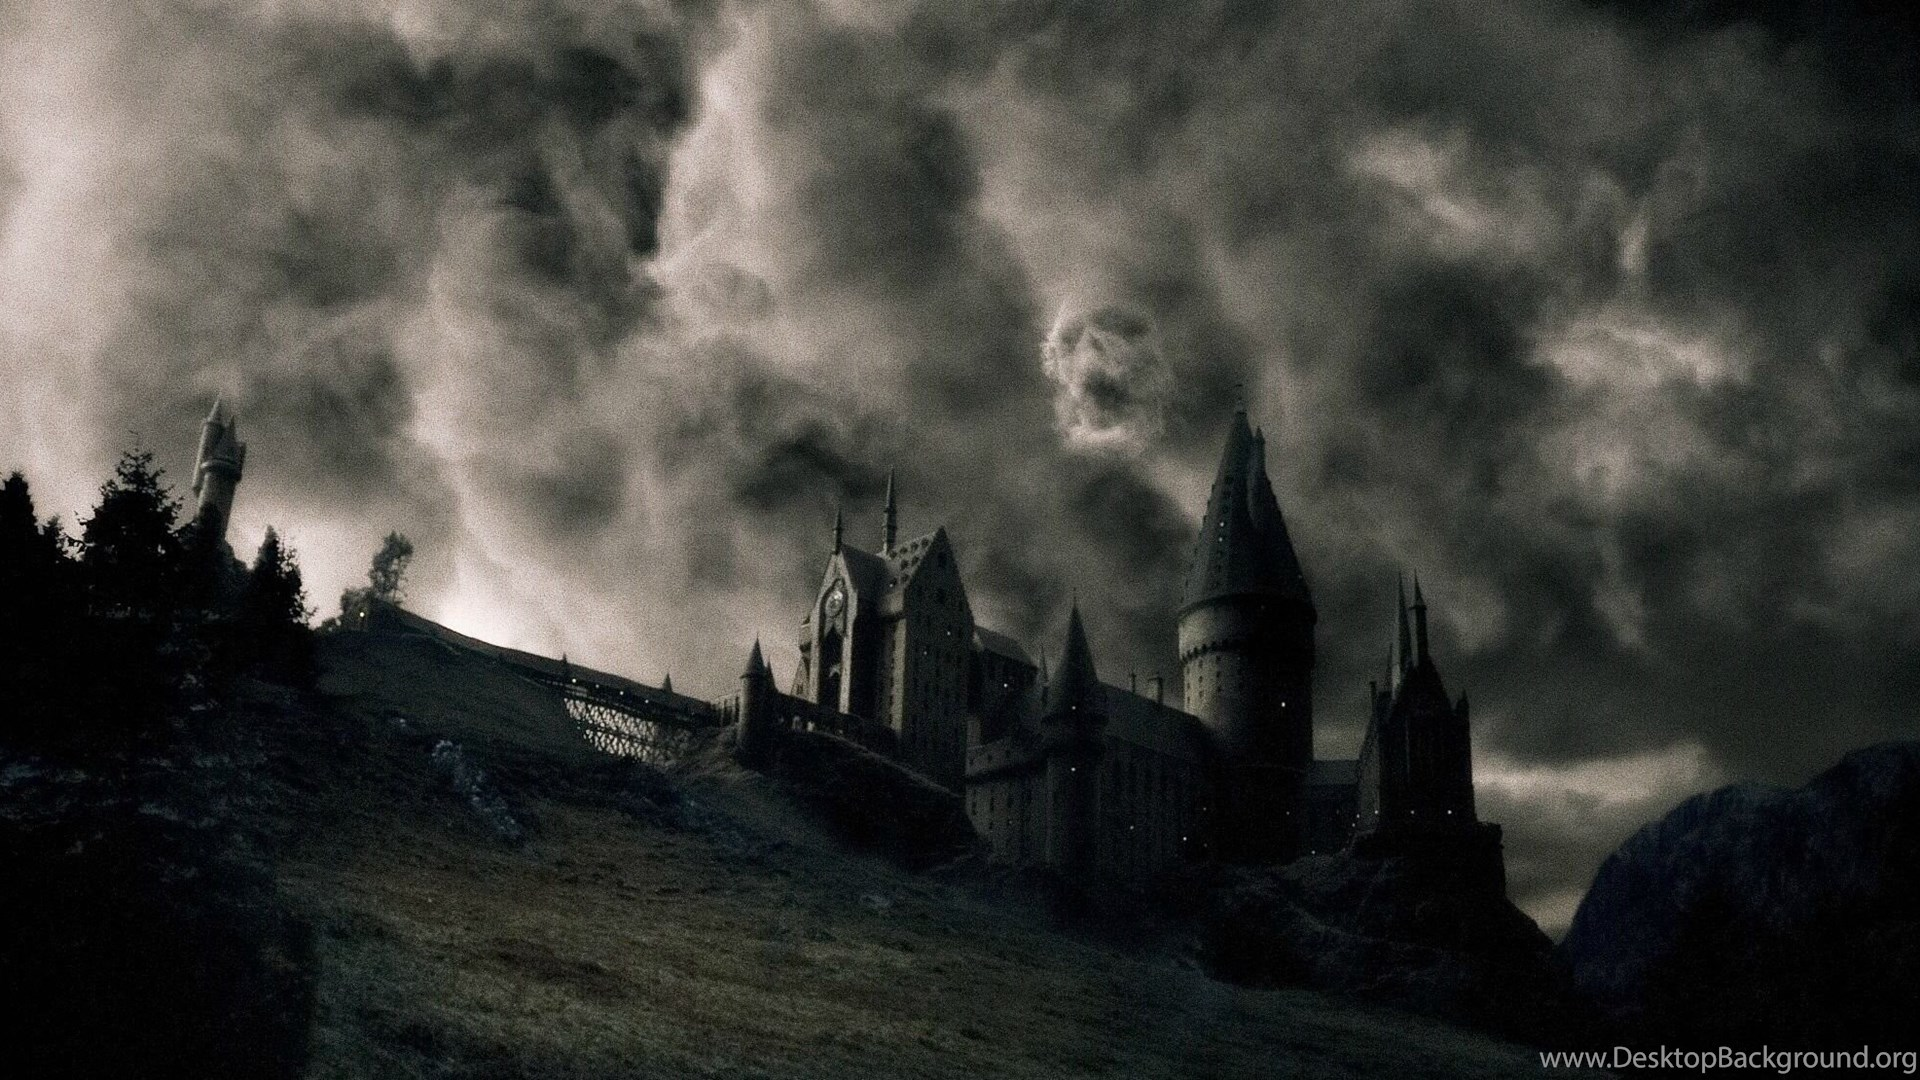 Harry Potter Desktop Background: Harry Potter Computer Wallpapers, Desktop Backgrounds